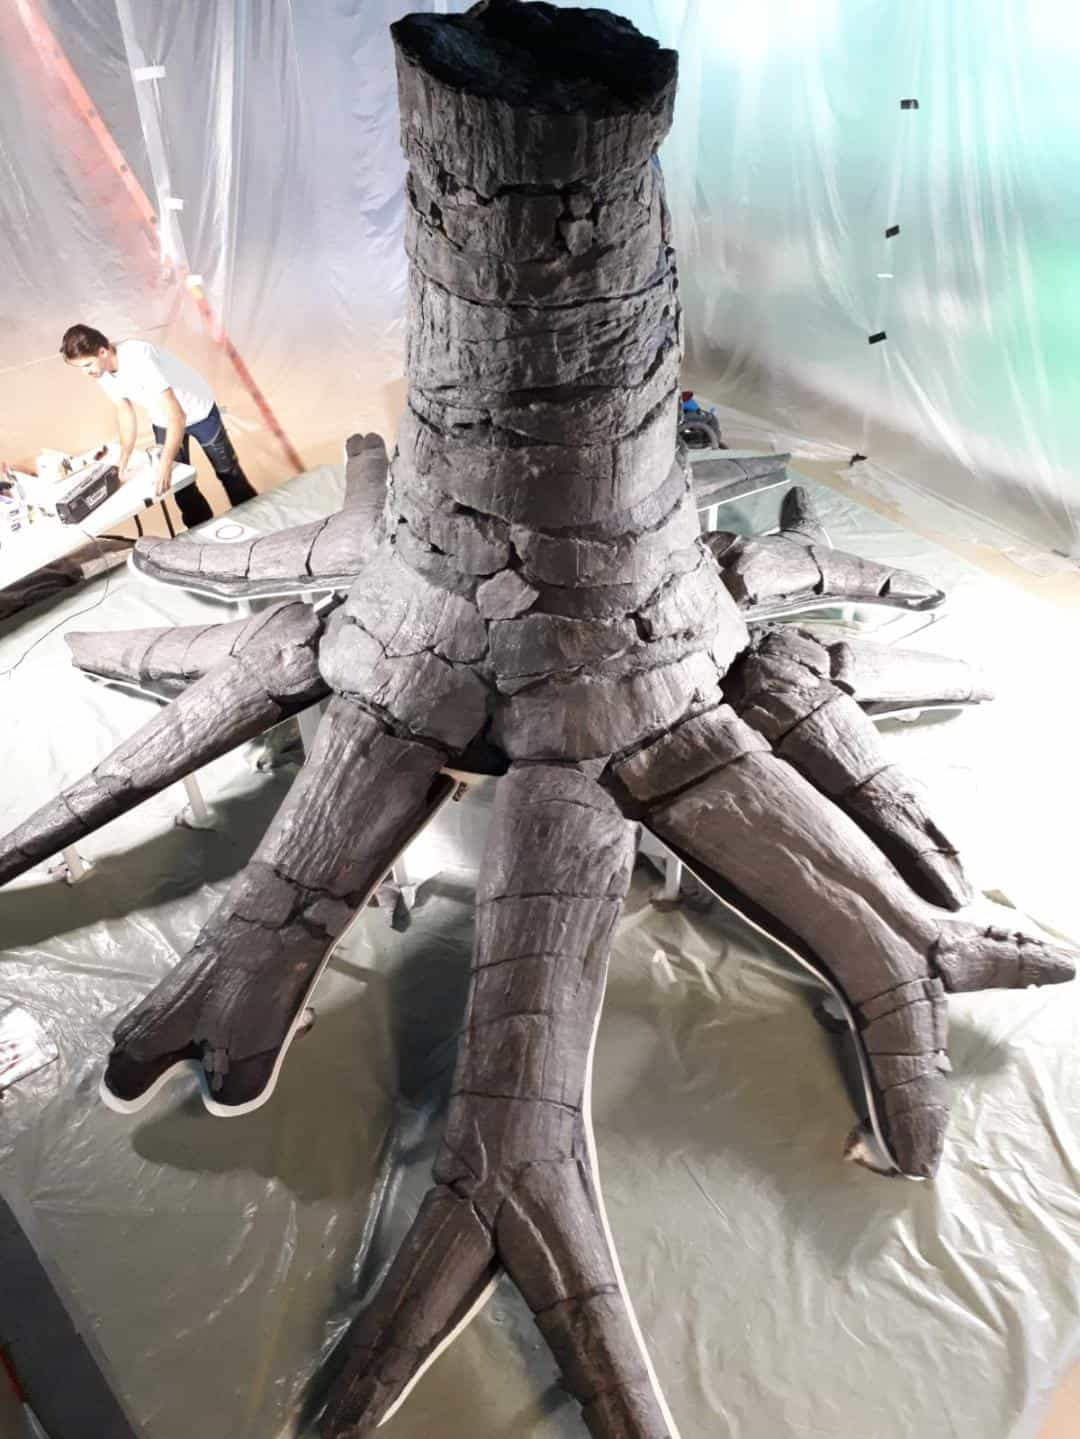 Fossils & Dinosaurs | Re-assembling the Carbon Tree | Bergbaumuseum Bochum, Germany